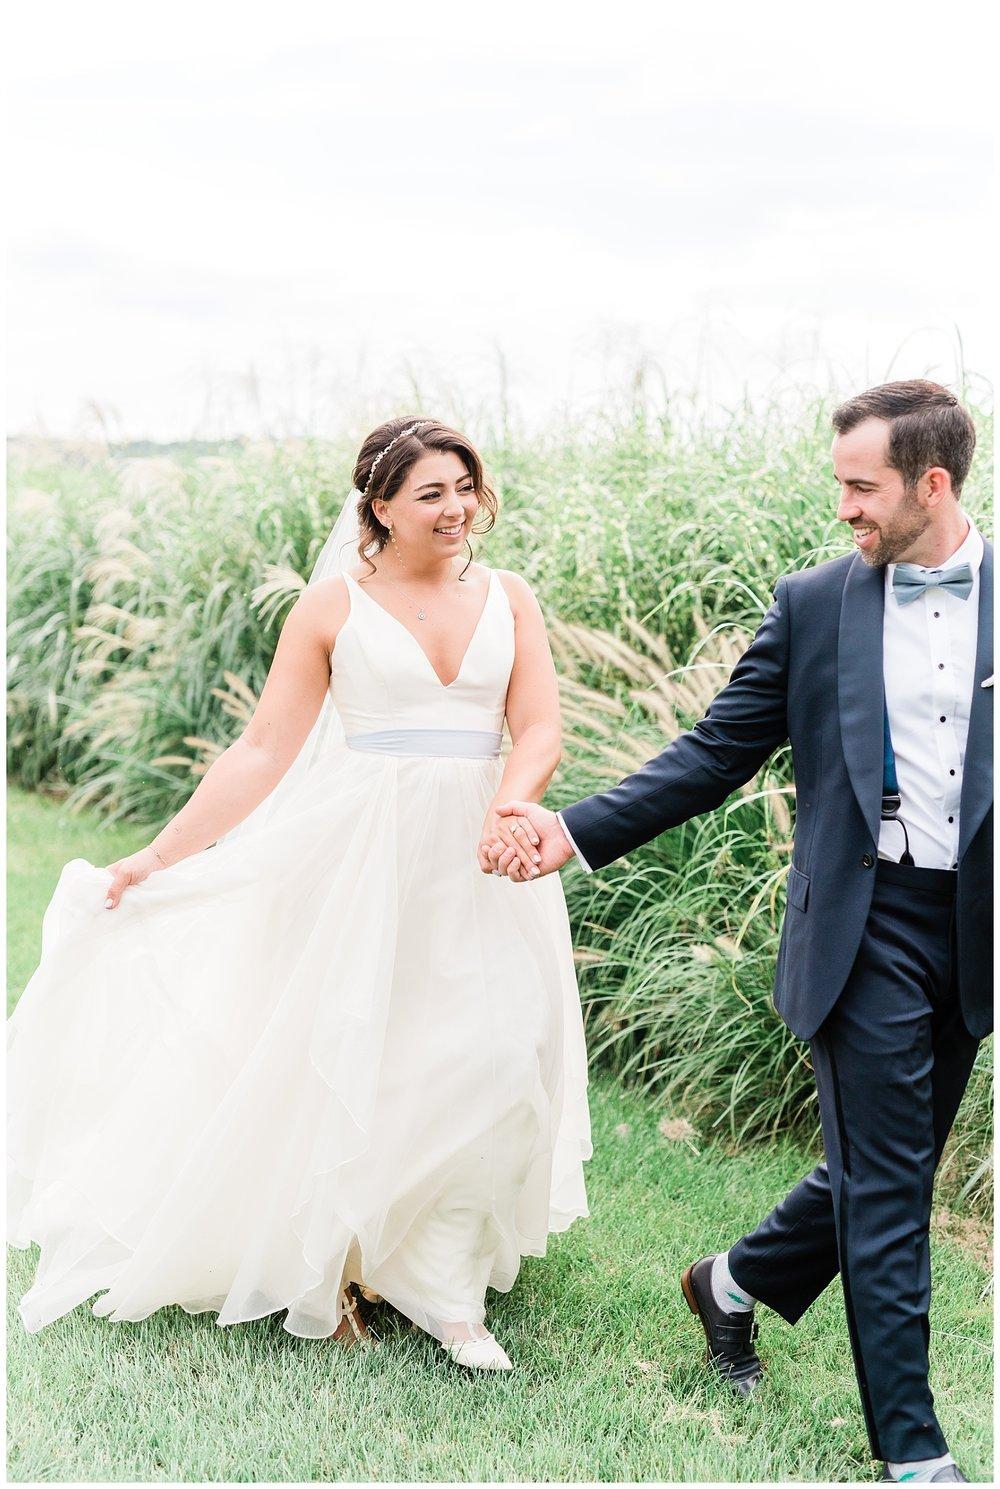 Indian-Trail-Club-Franklin-Lakes-NJ-Summer-Stylish-Wedding-Photographer-Photo-_0103.jpg